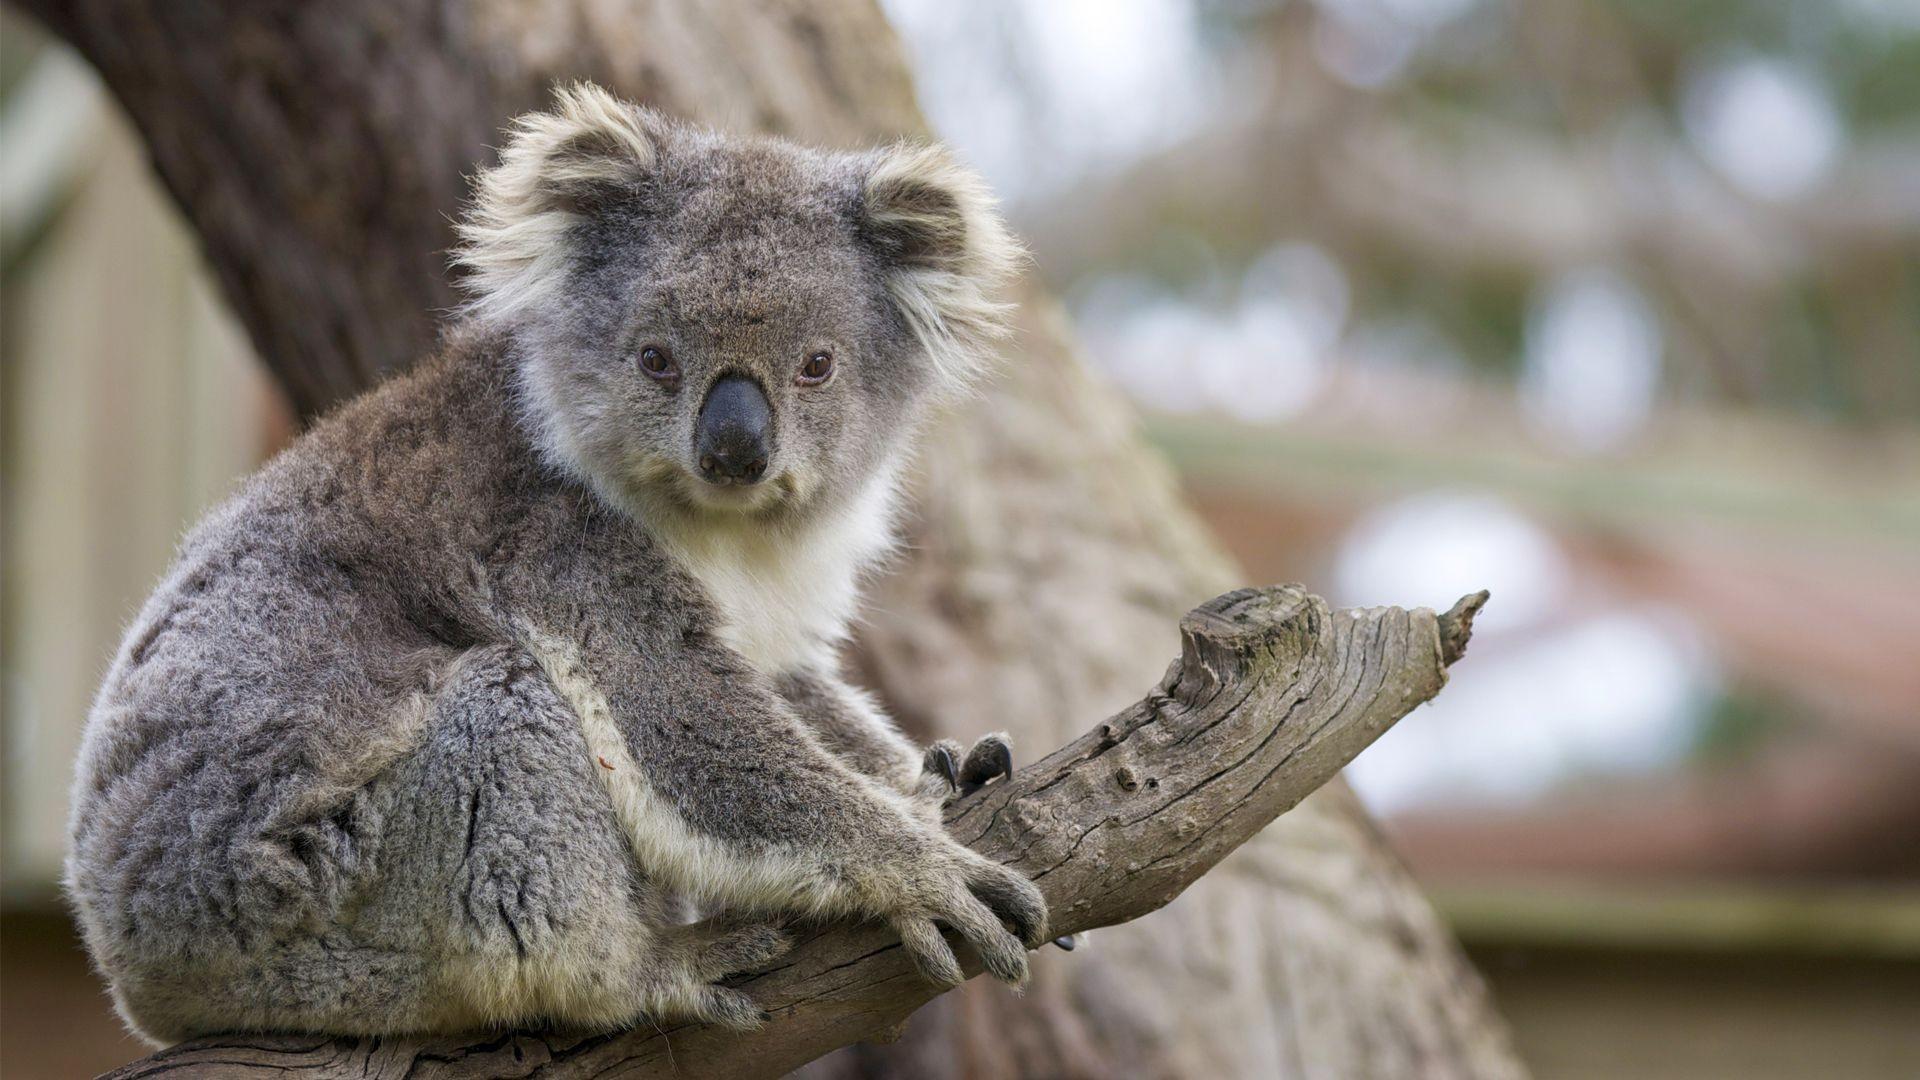 Baby koala wallpaper 57 images - Pictures of koalas and baby koalas ...